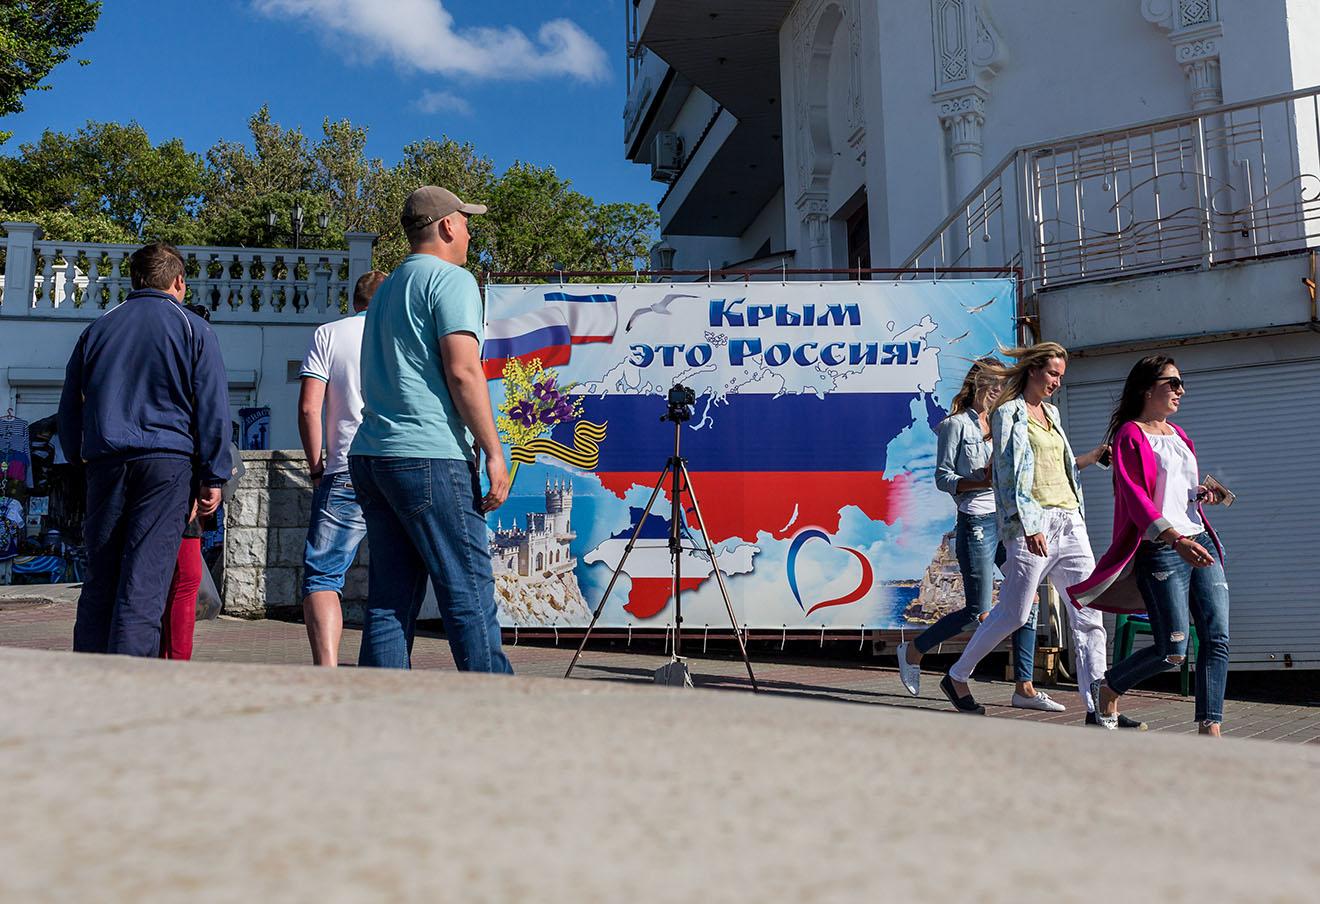 Фото: Arturas Morozovas / BarcroftImages / ТАСС